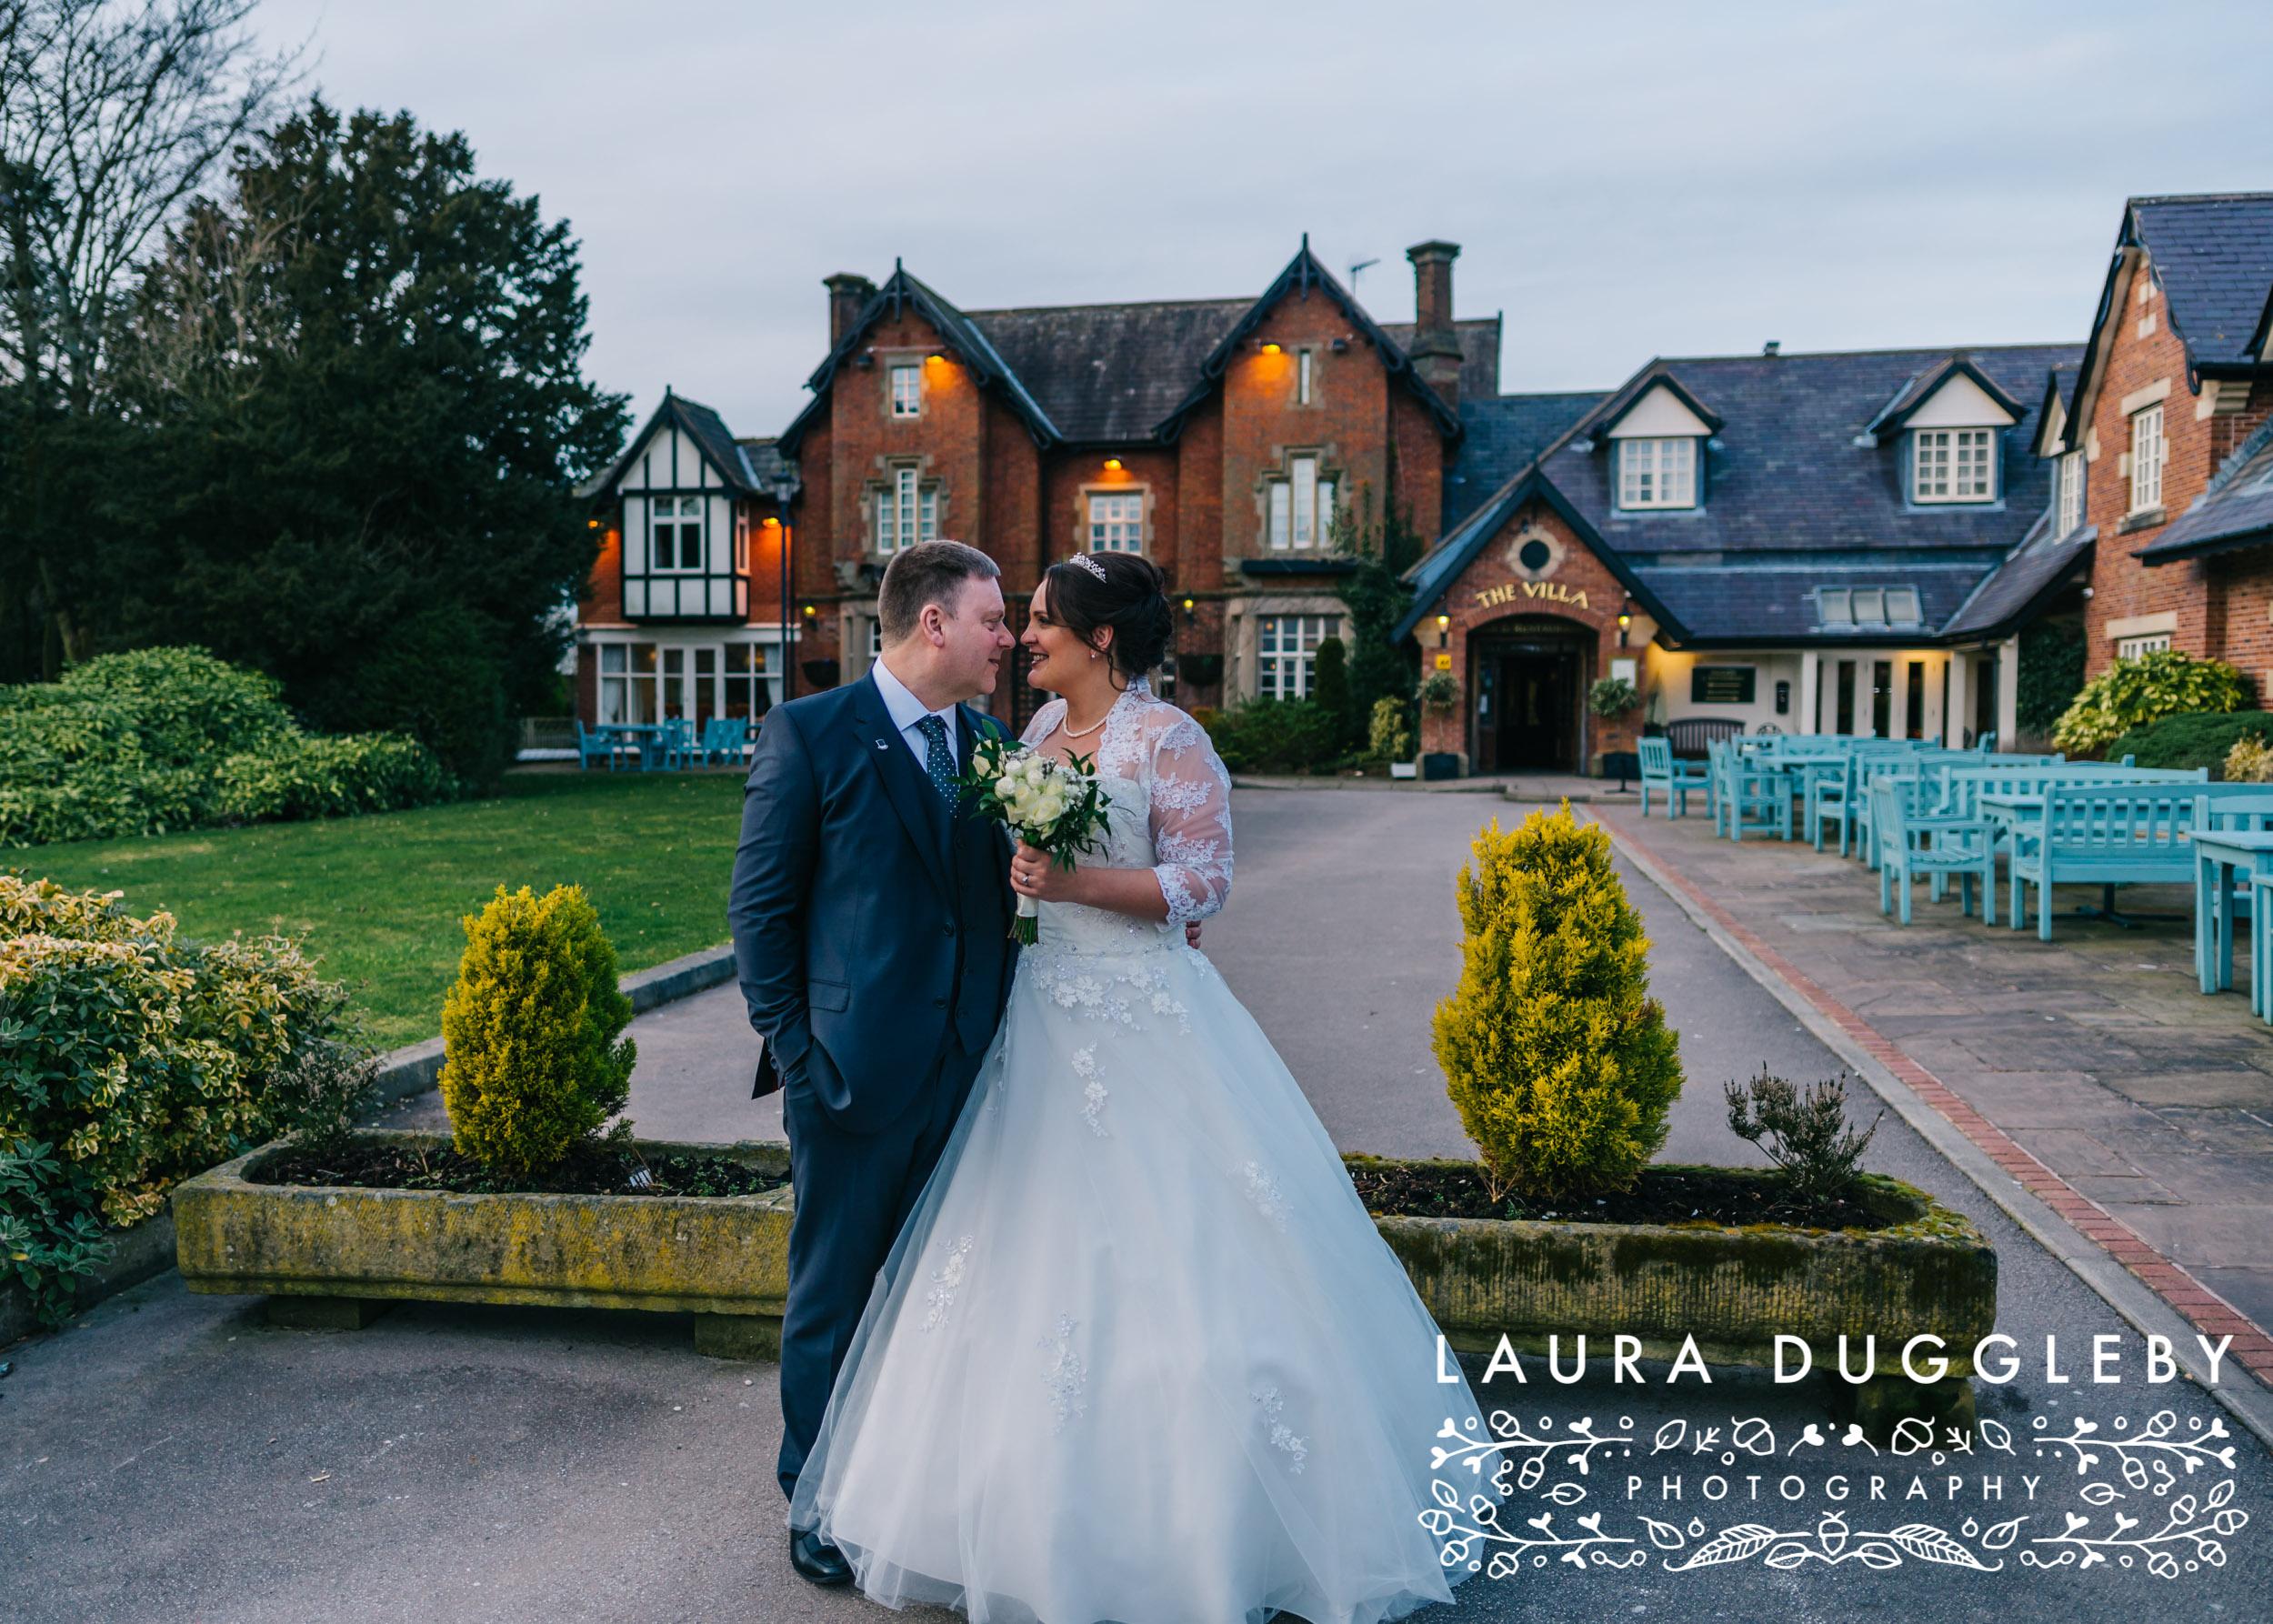 The Villa Hotel - Wrea Green Lancashire Wedding Photographer16